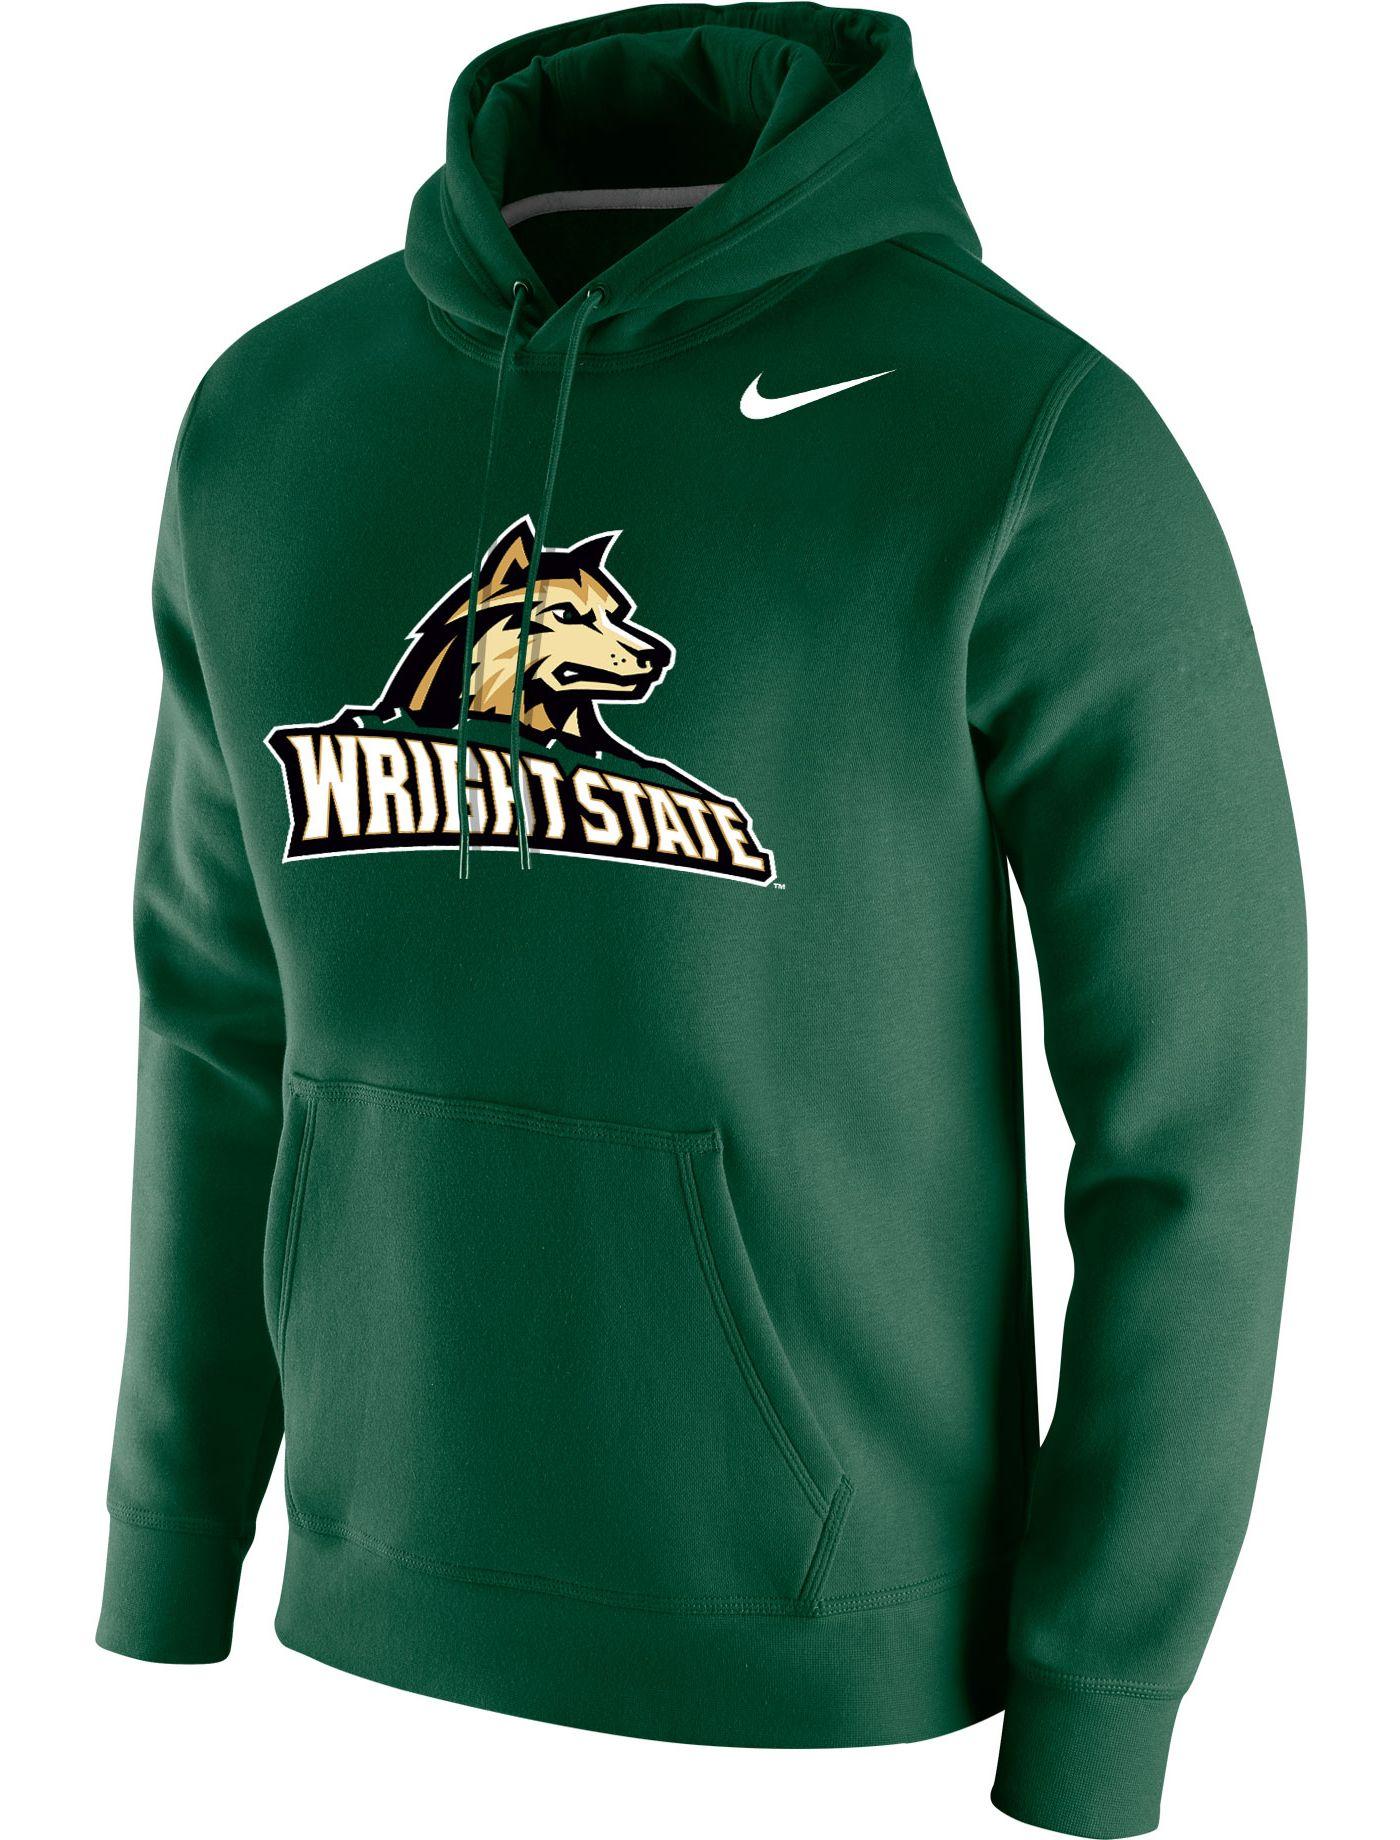 Nike Men's Wright State Raiders Green Club Fleece Pullover Hoodie